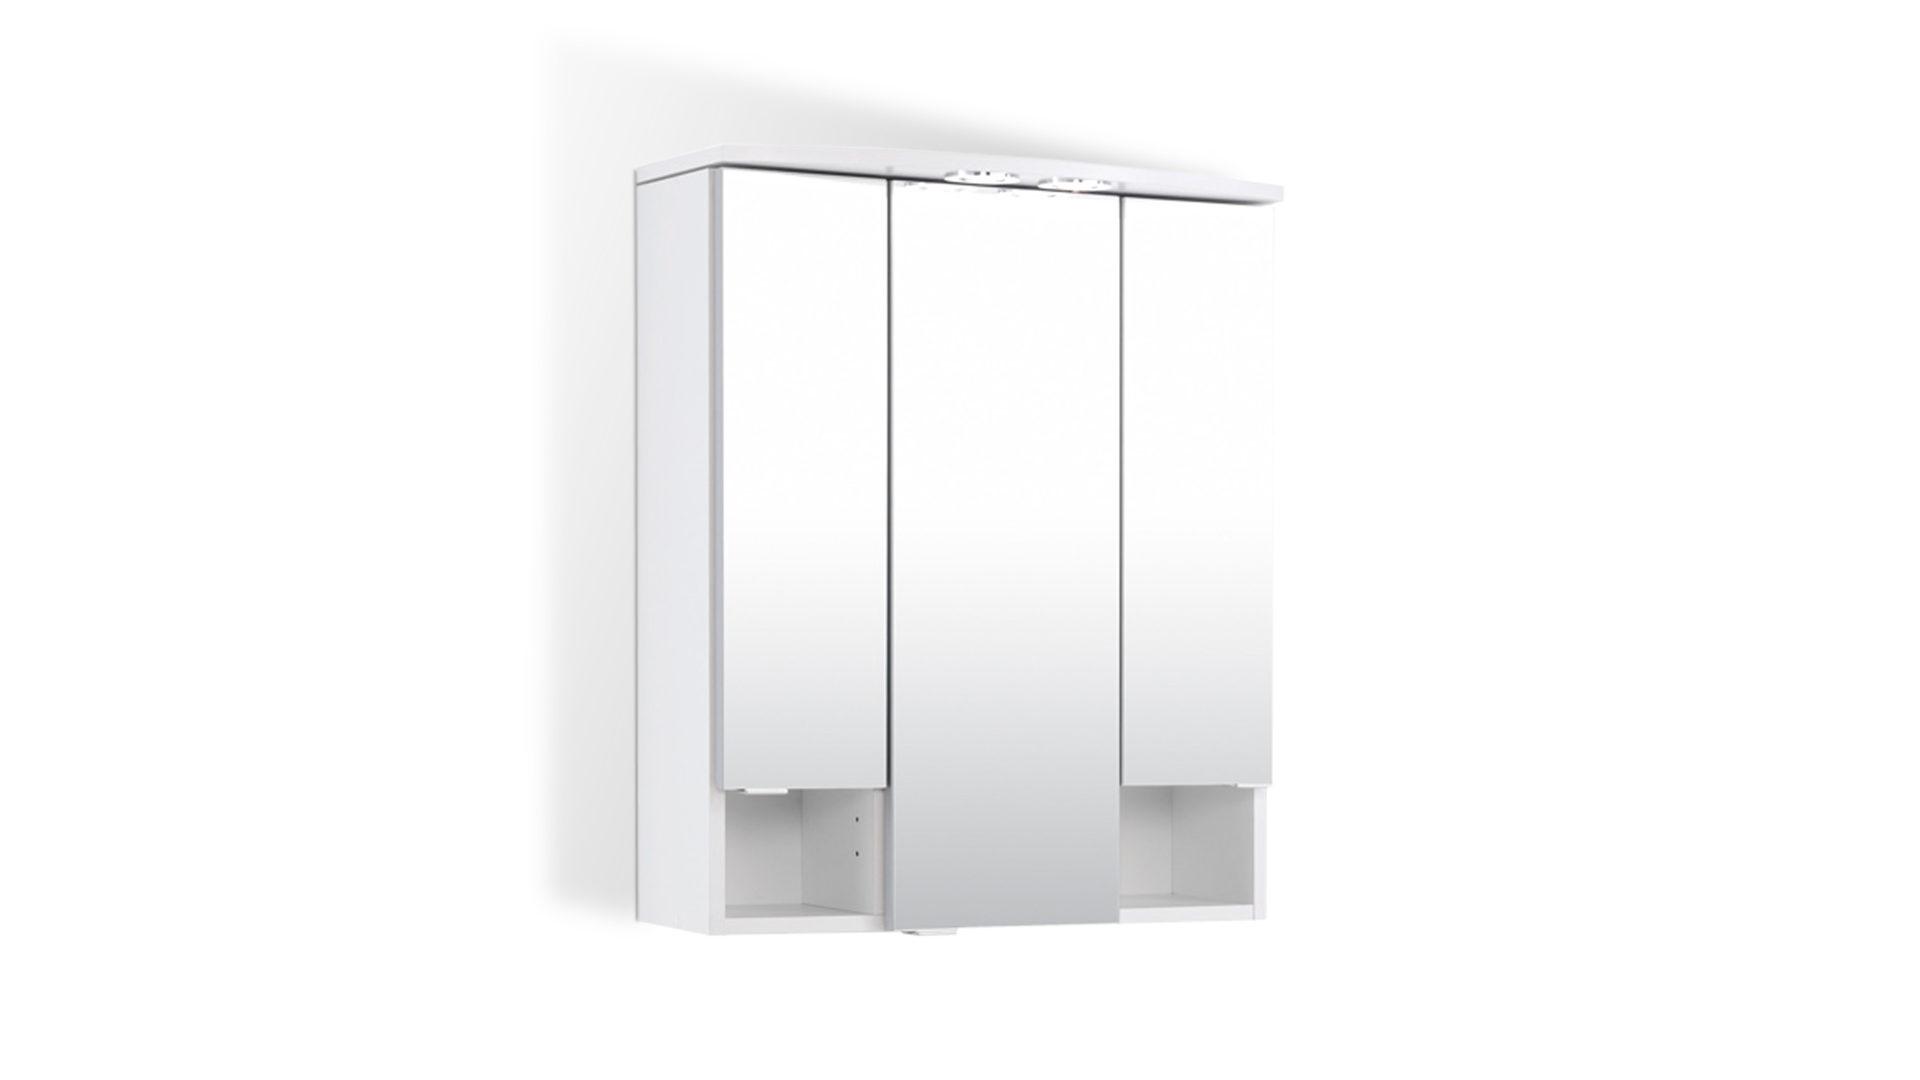 Mobelhaus Thiex Gmbh Raume Badezimmer Accessoires Spiegelschrank